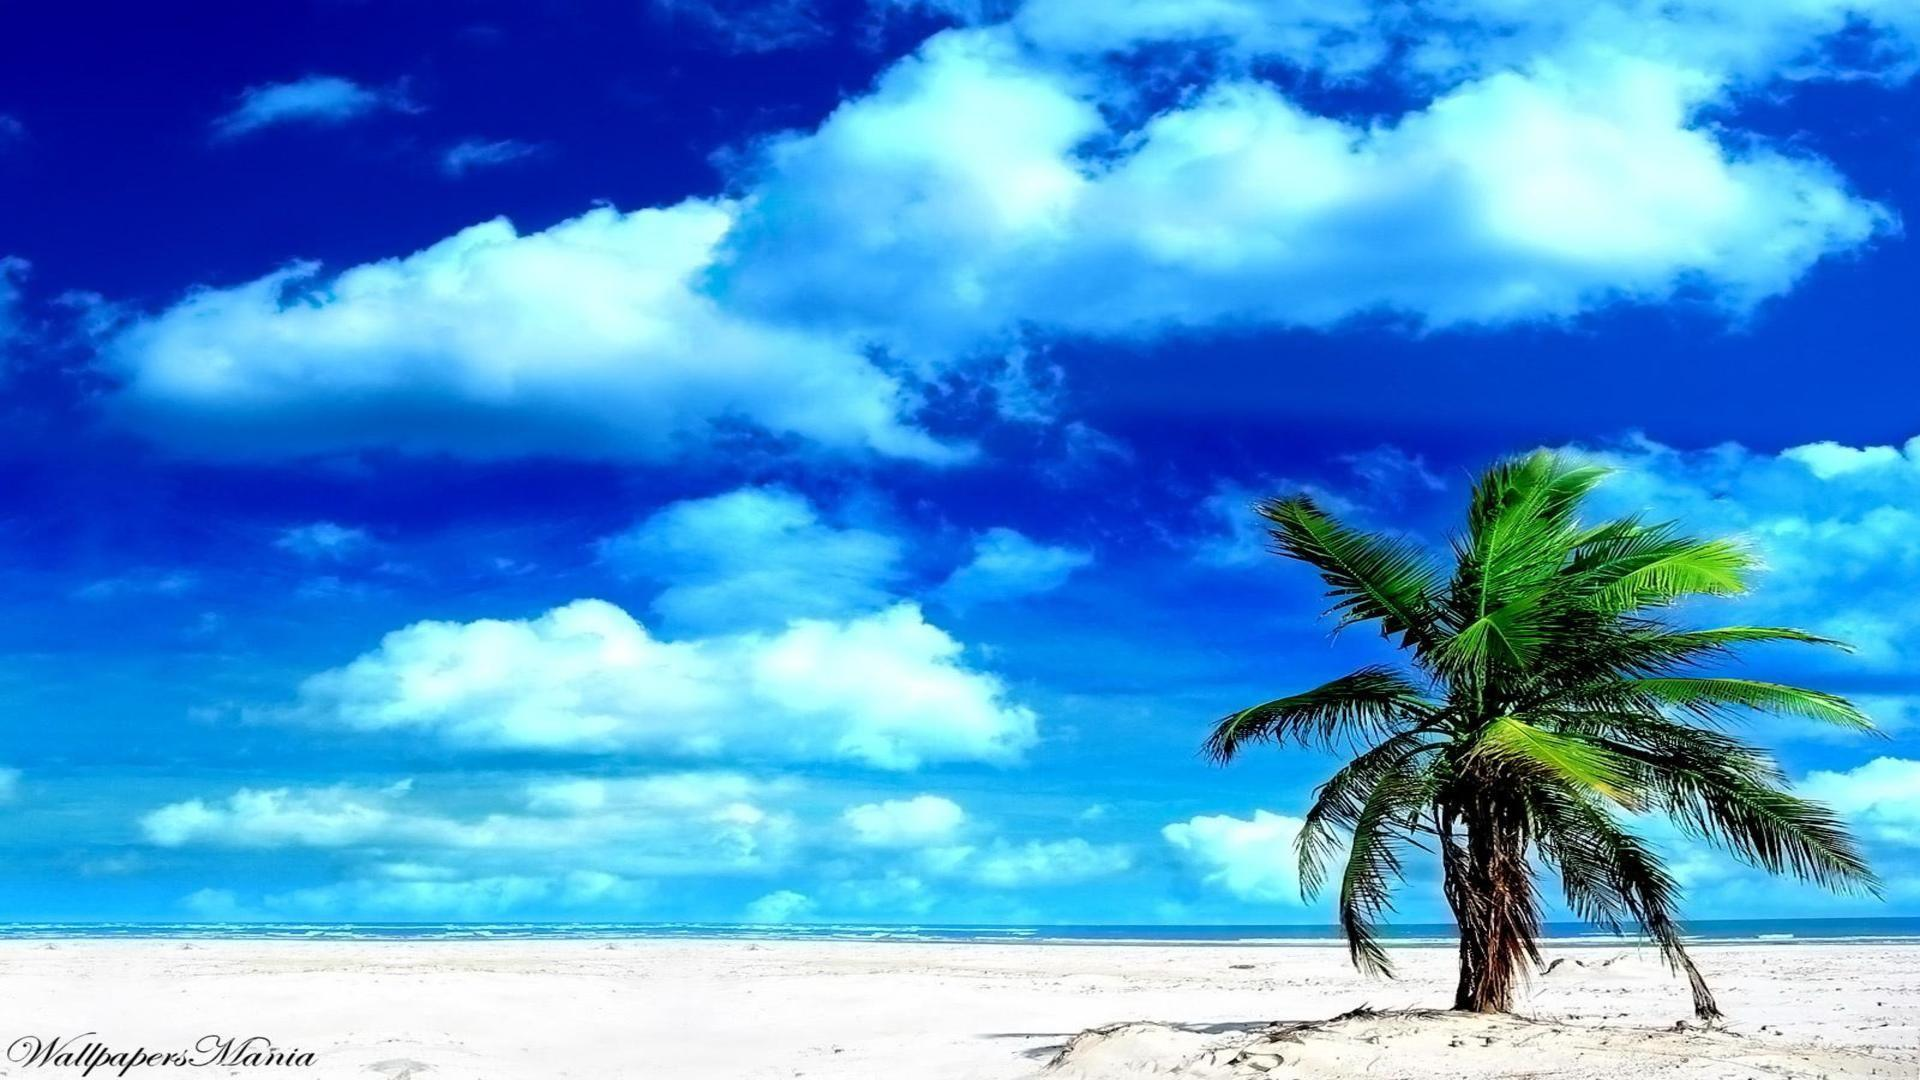 Tropical Backgrounds hd, wallpaper, Tropical Backgrounds hd hd ...